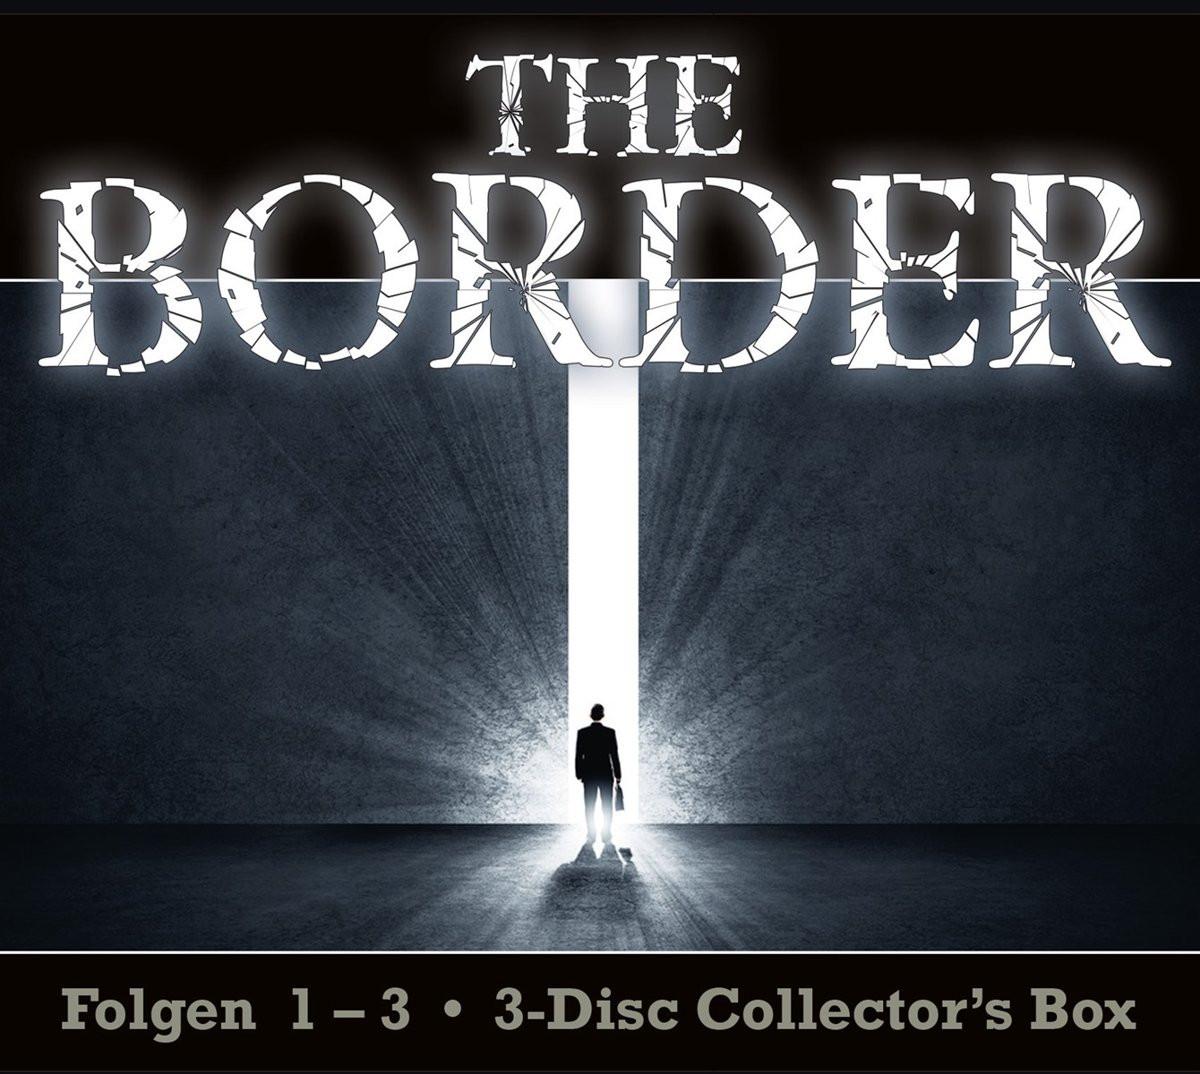 The Border 3-Disc Collector's Box